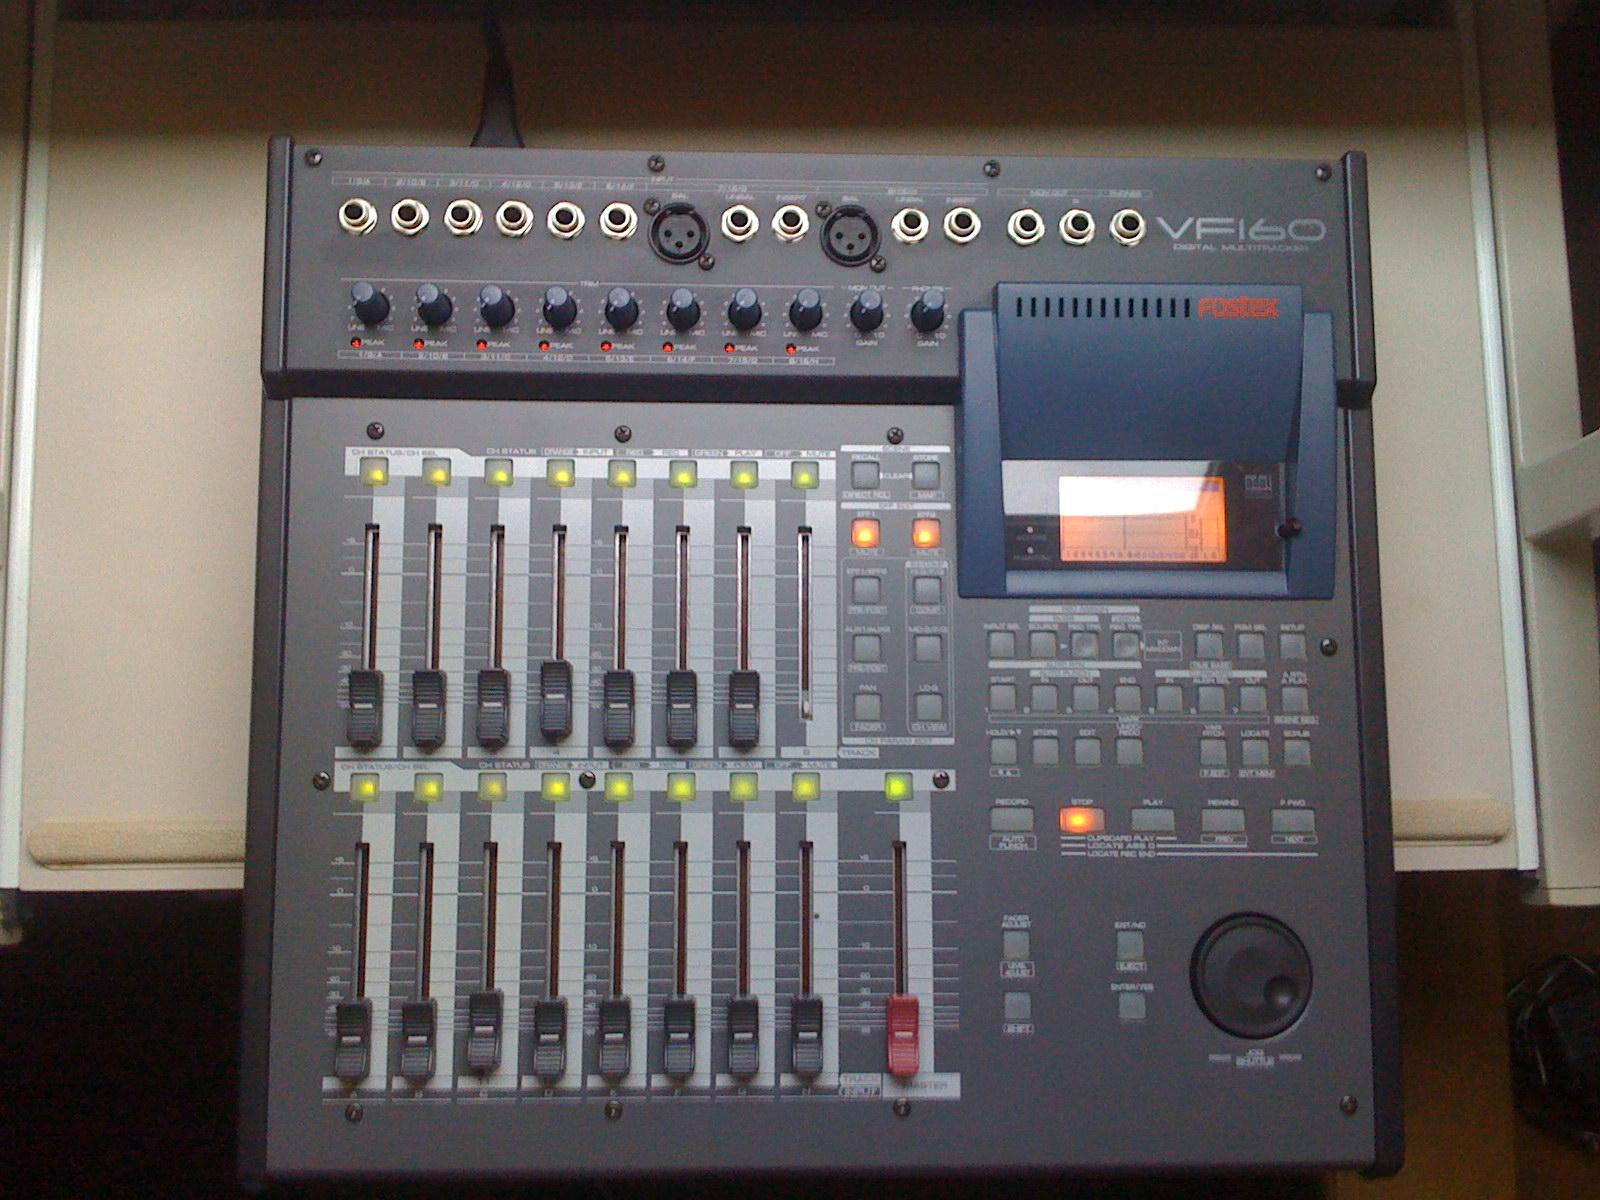 fostex vf160 cd image 698579 audiofanzine rh en audiofanzine com Fostex Digital Recorder Fostex VF160EX Hard Drive